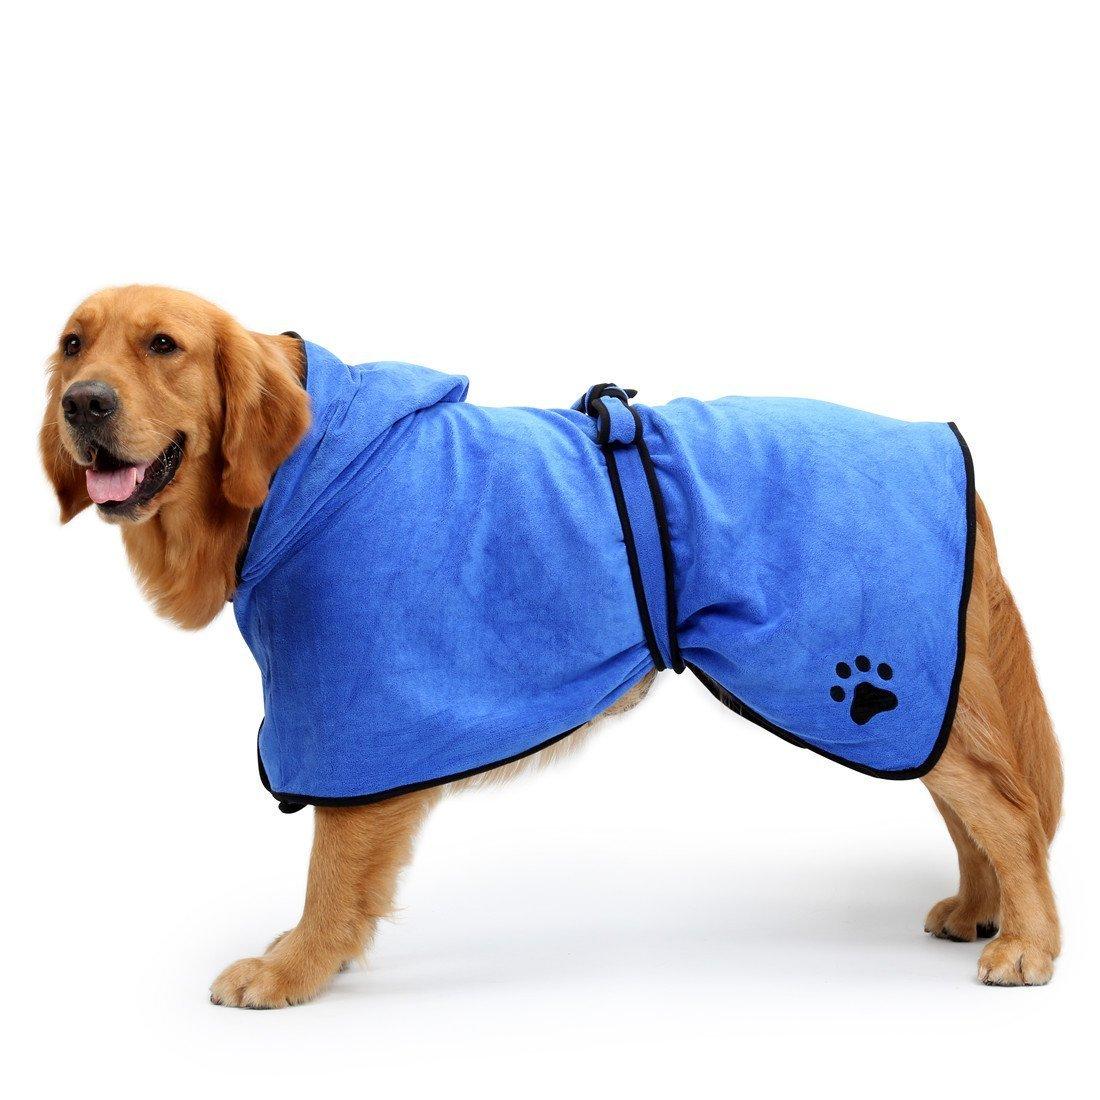 BONAWEN Dog Easy Wear Dog Towel Luxuriously Soft 100% Microfiber Pet Bathrobe Super Absorbent with Waist Belt&Hood